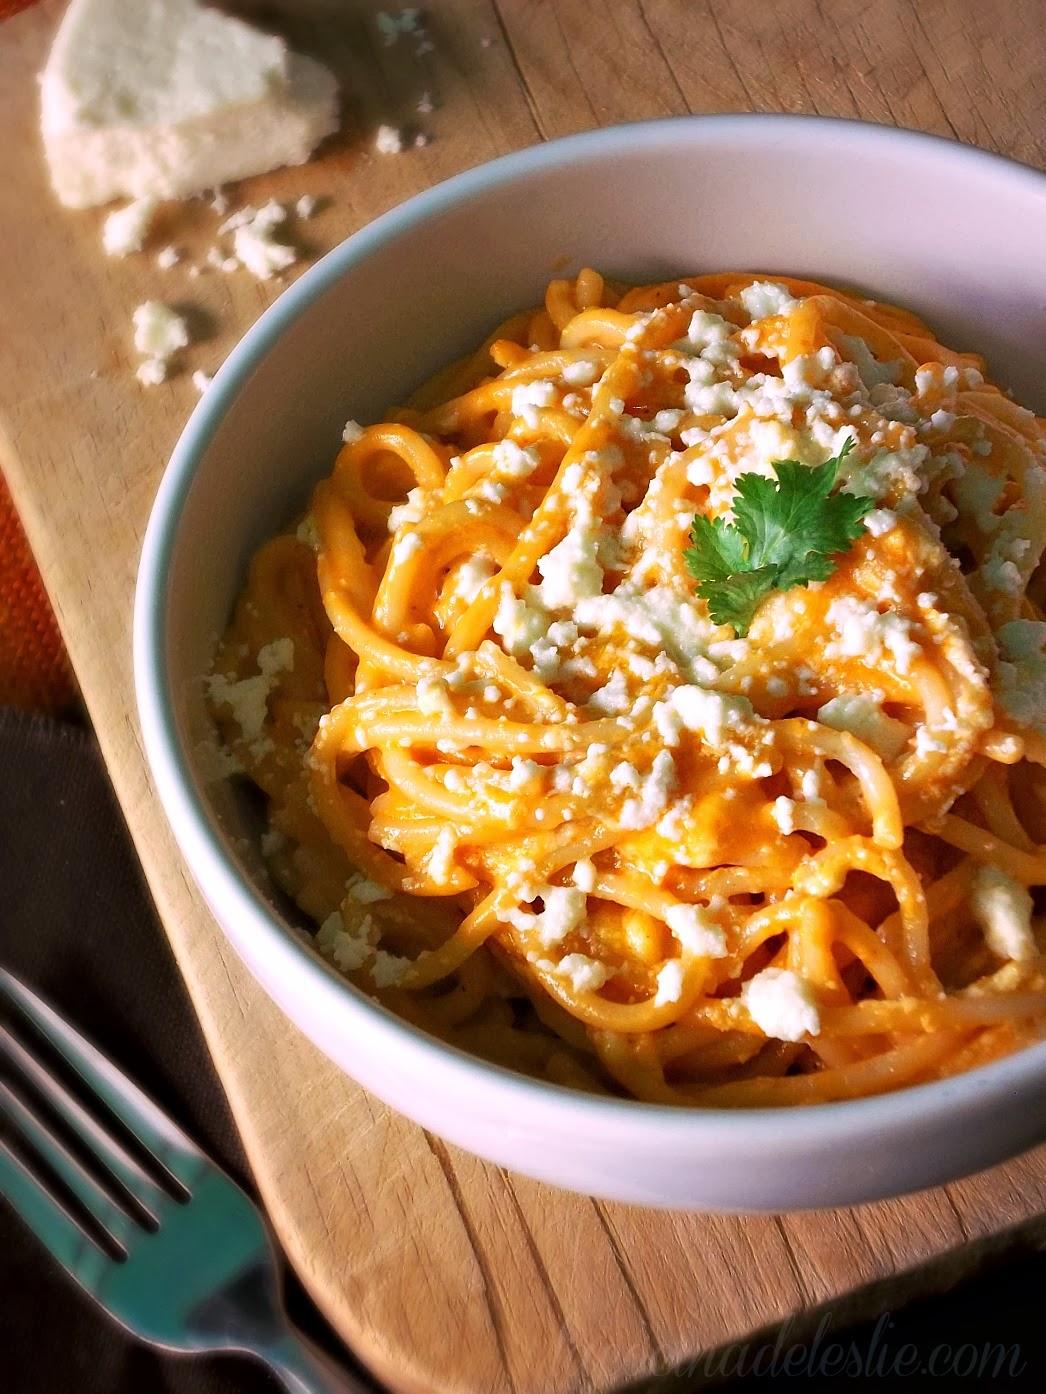 Sopa de Espagueti Mexicana receta - lacocinadeleslie.com